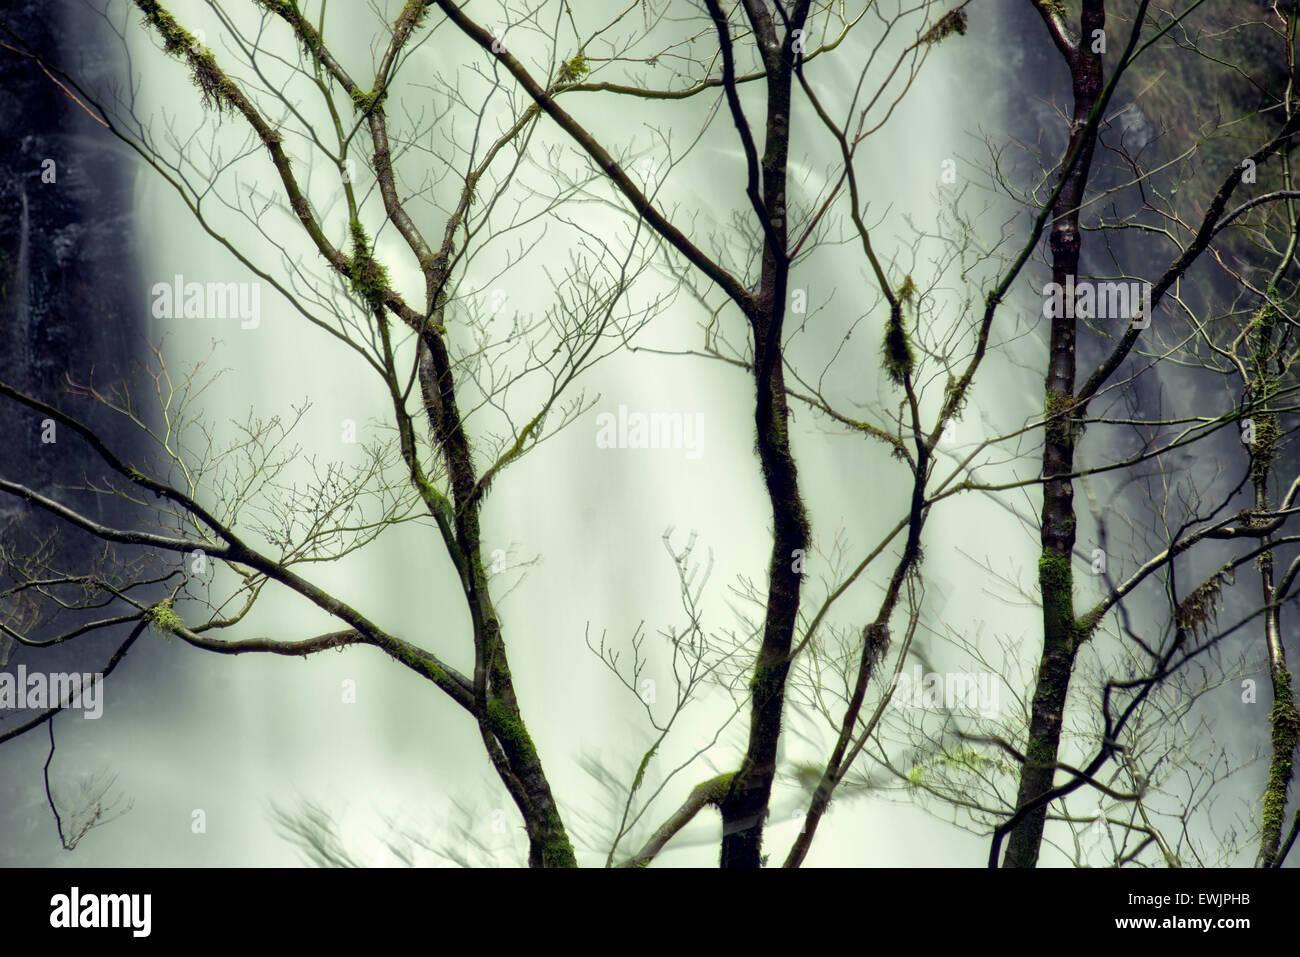 Cae un doble desnudo con árboles de invierno. Silver Falls State Park, Oregón Imagen De Stock